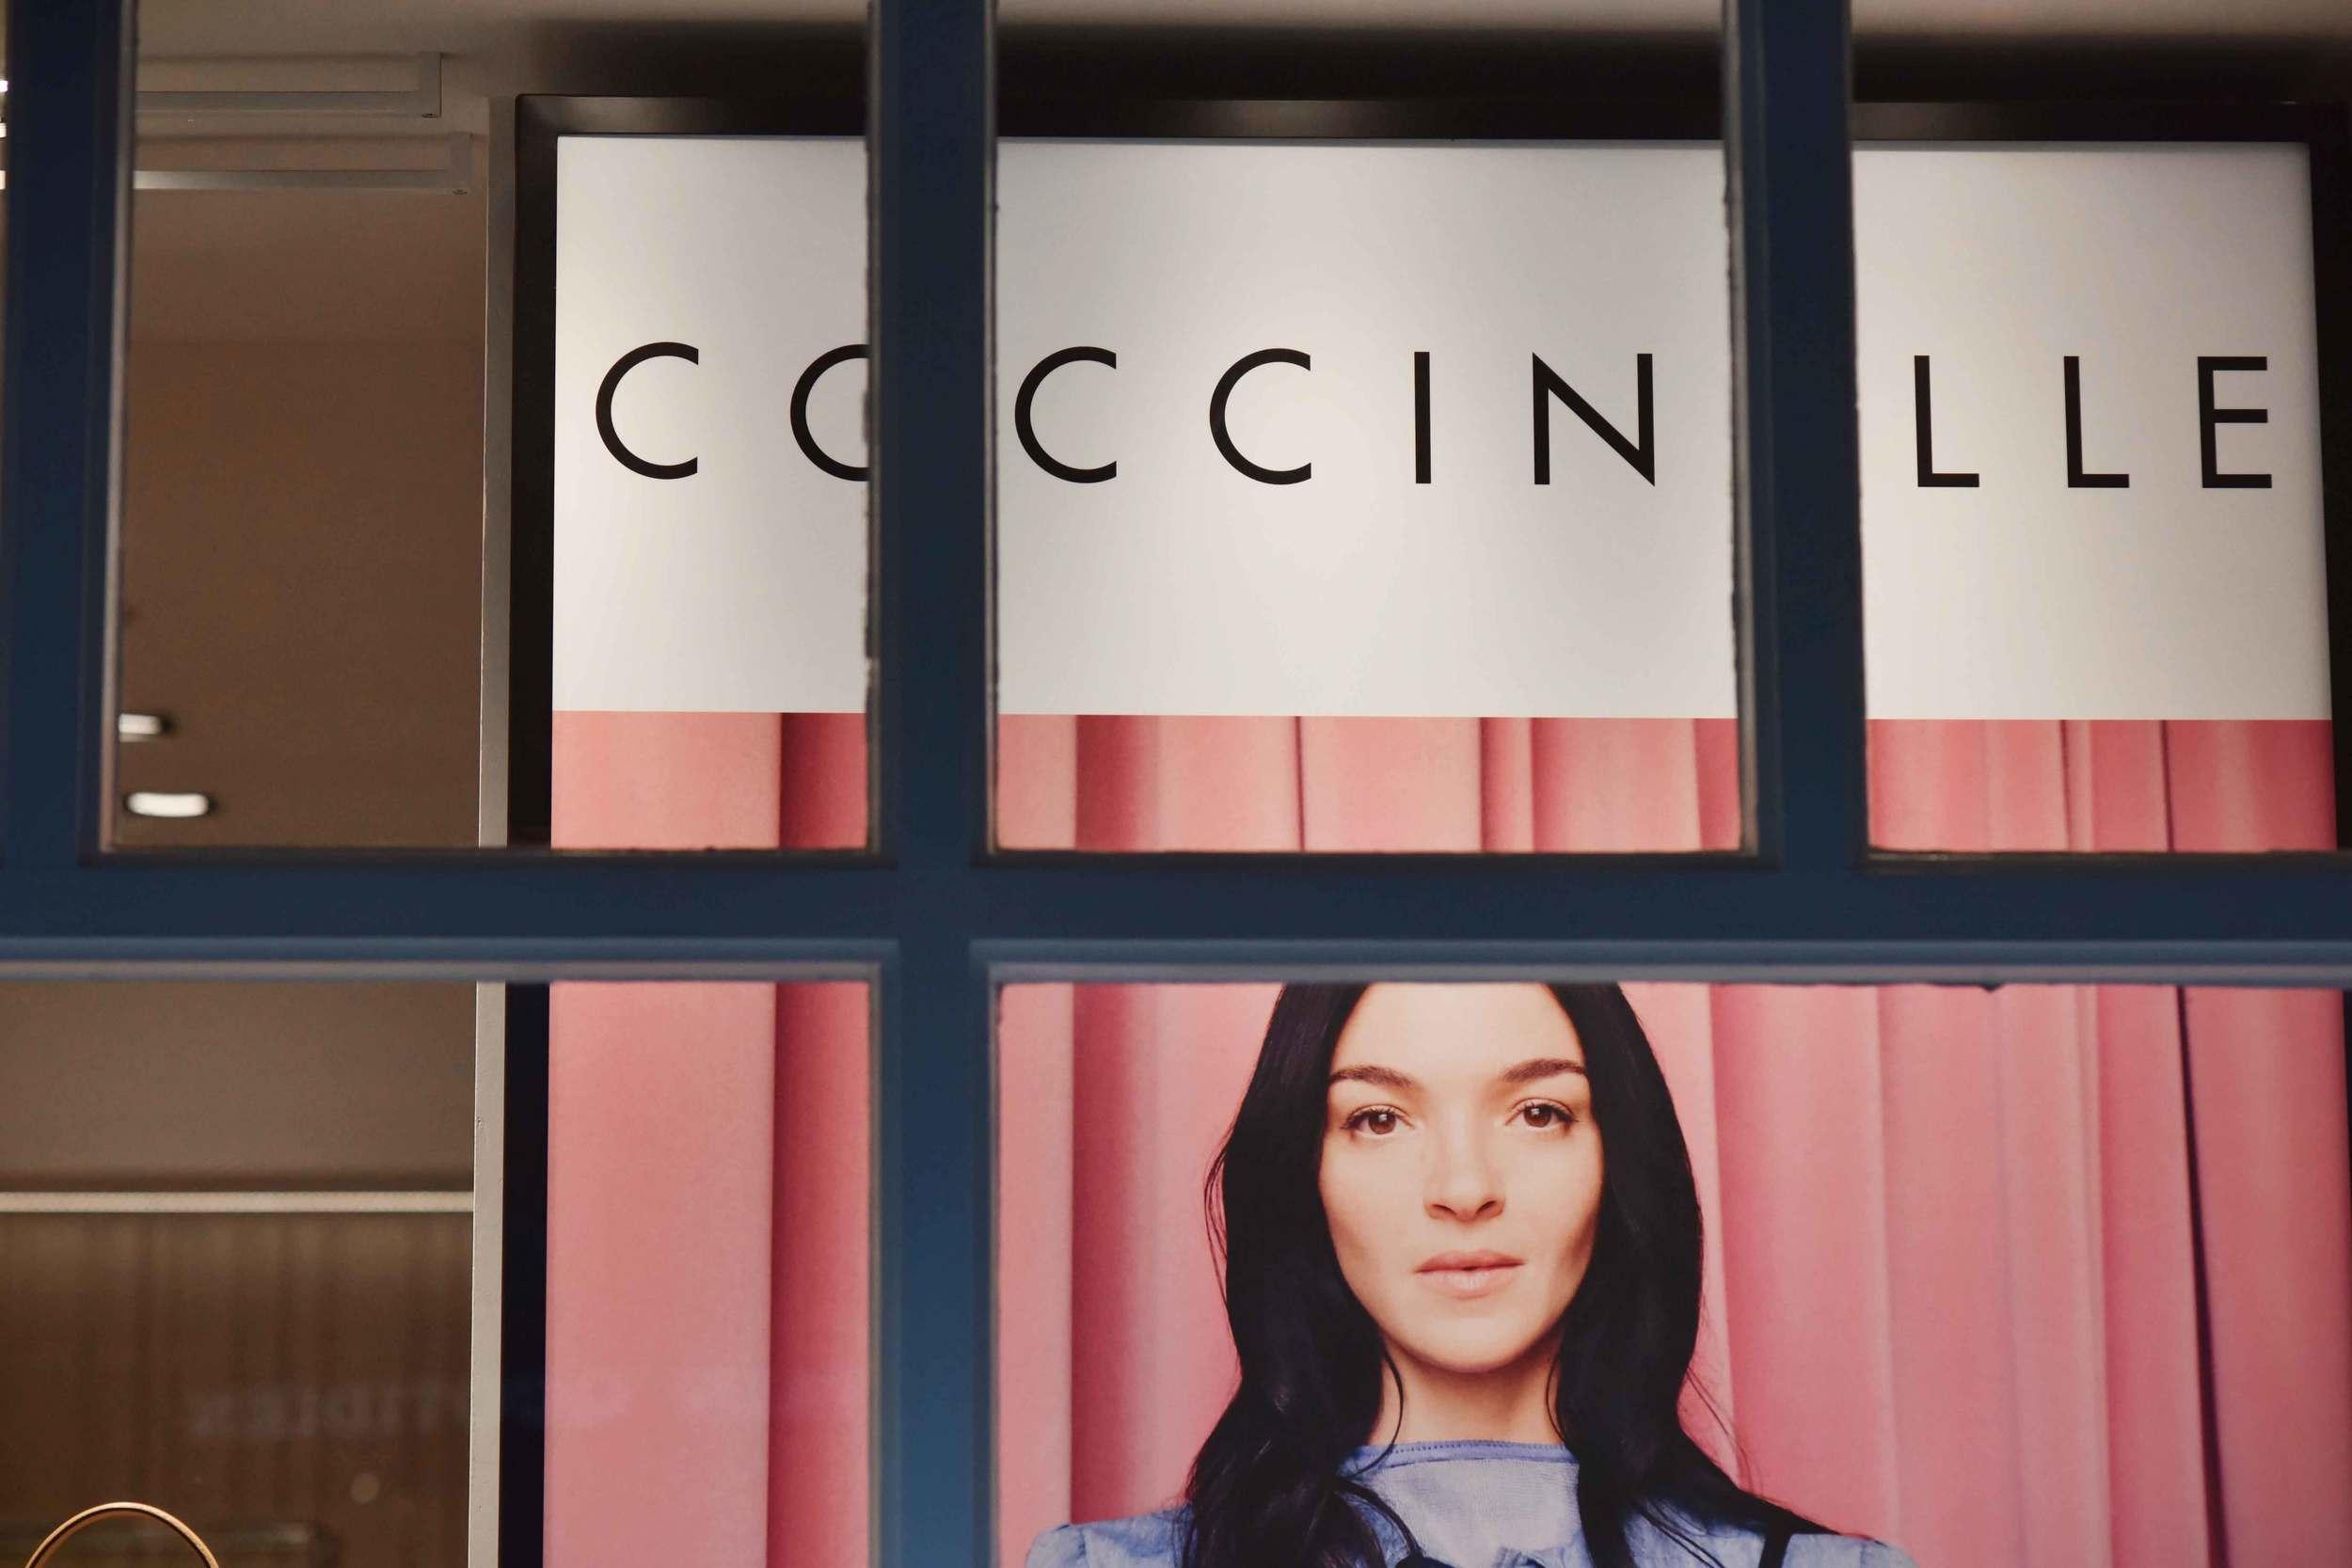 Coccinelle store, Bicester village, designer shopping outlet near London, UK. Image©sourcingstyle.com